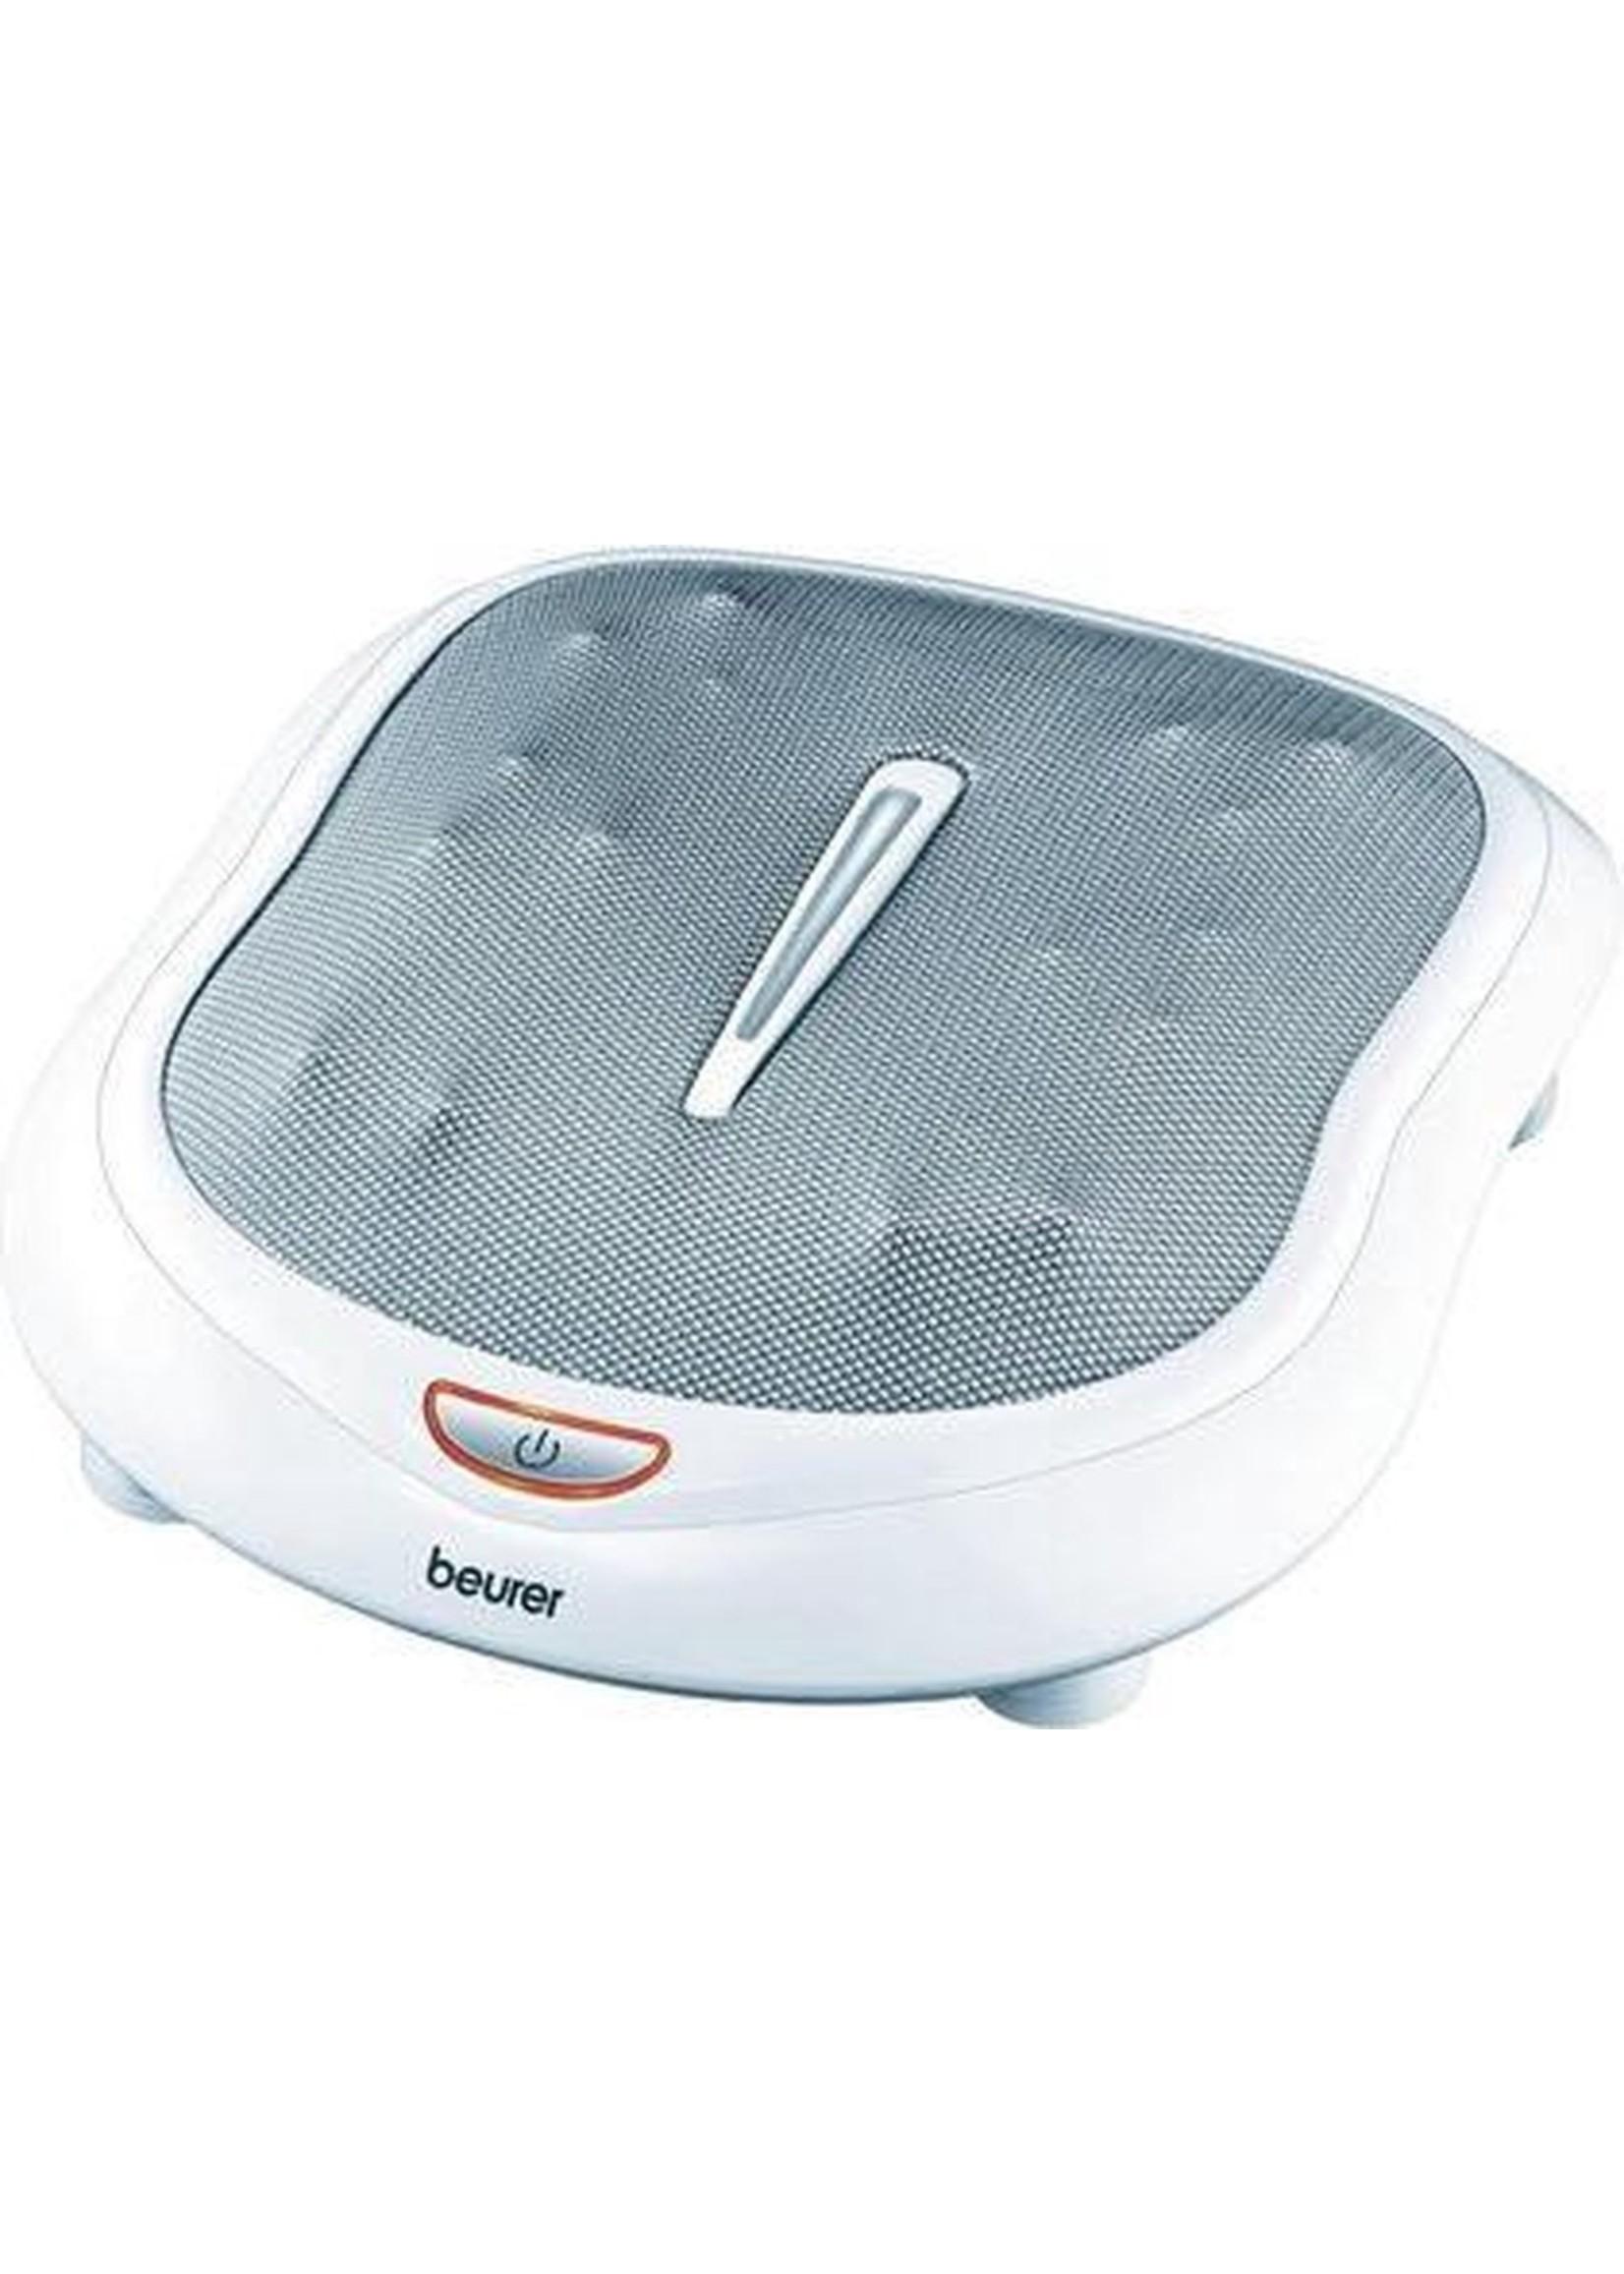 Beurer Beurer FM60 - Voetmassage - Shiatsu